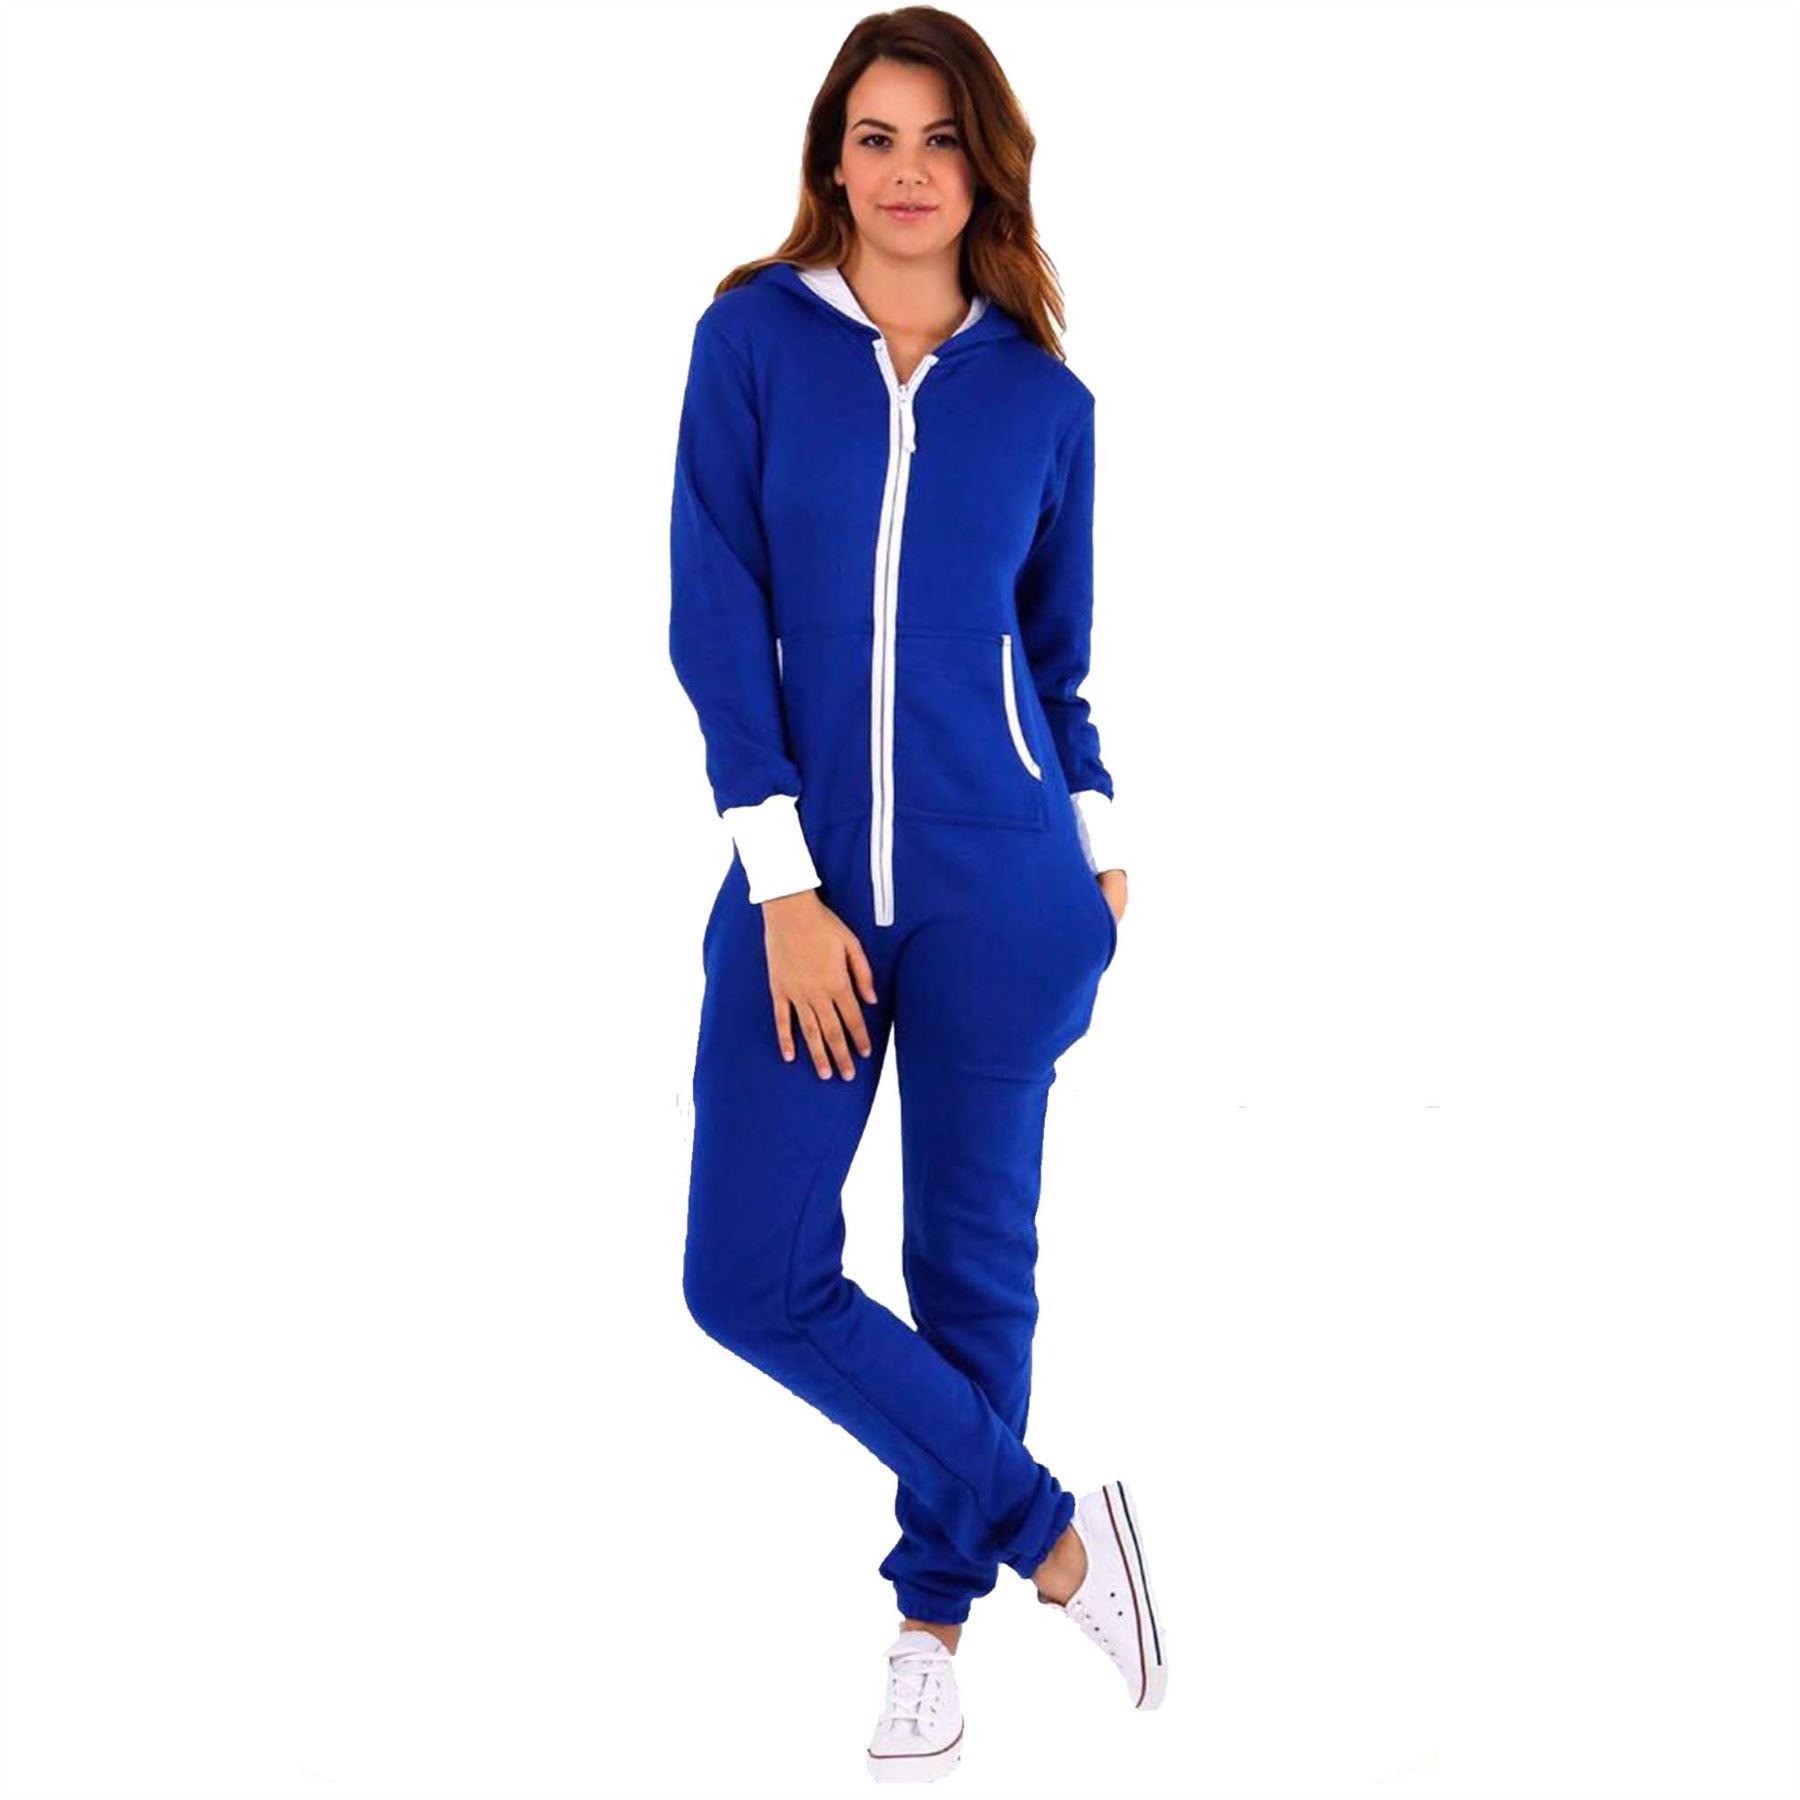 c1c8aae95ee Details about Womens Ladies Adult Hooded Plain Onesie Not Gerber All In One  Playsuit Jumpsuit